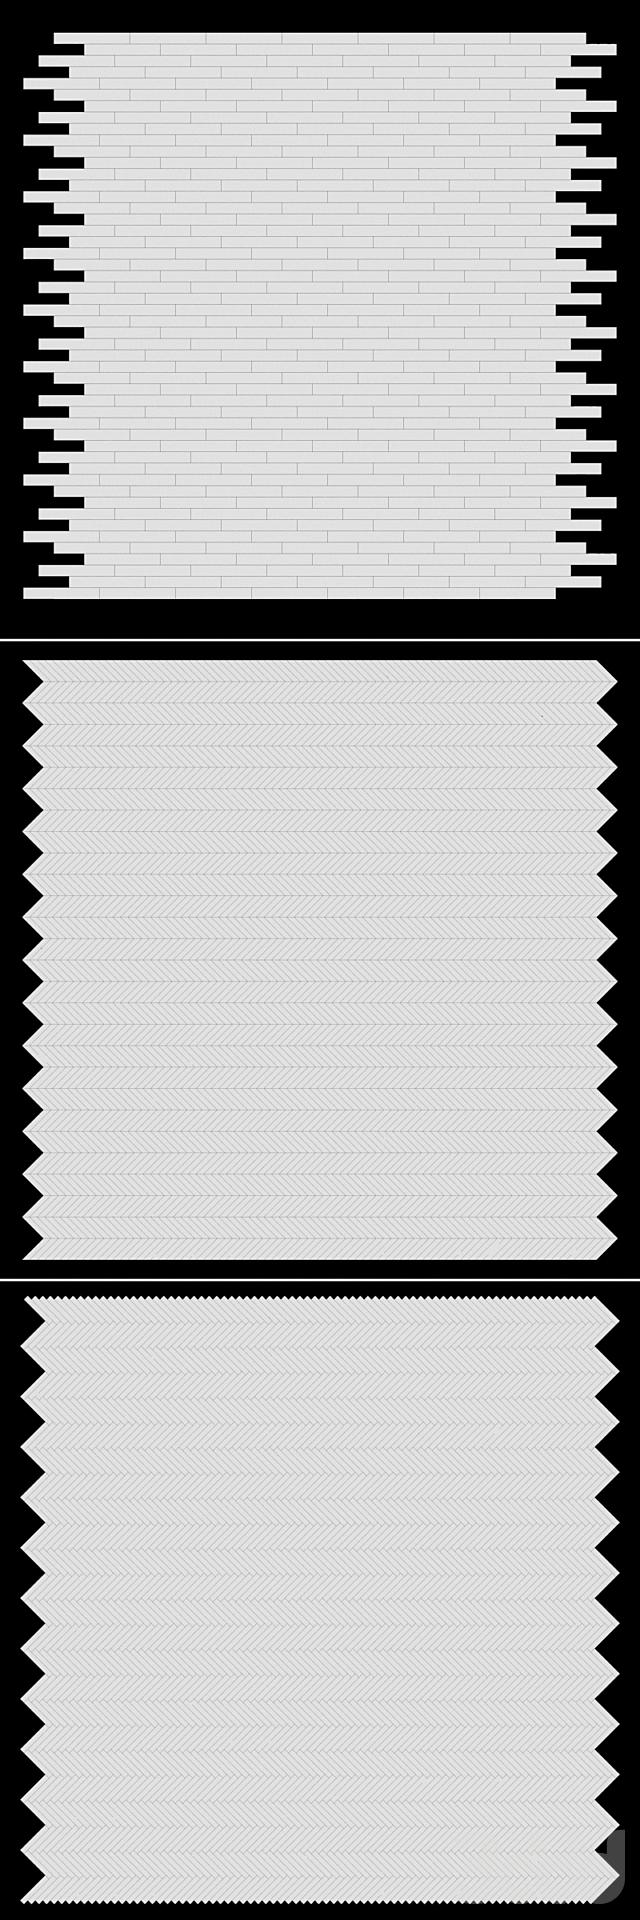 Паркет Клен, 3 вида: елочка, линейный, шеврон.